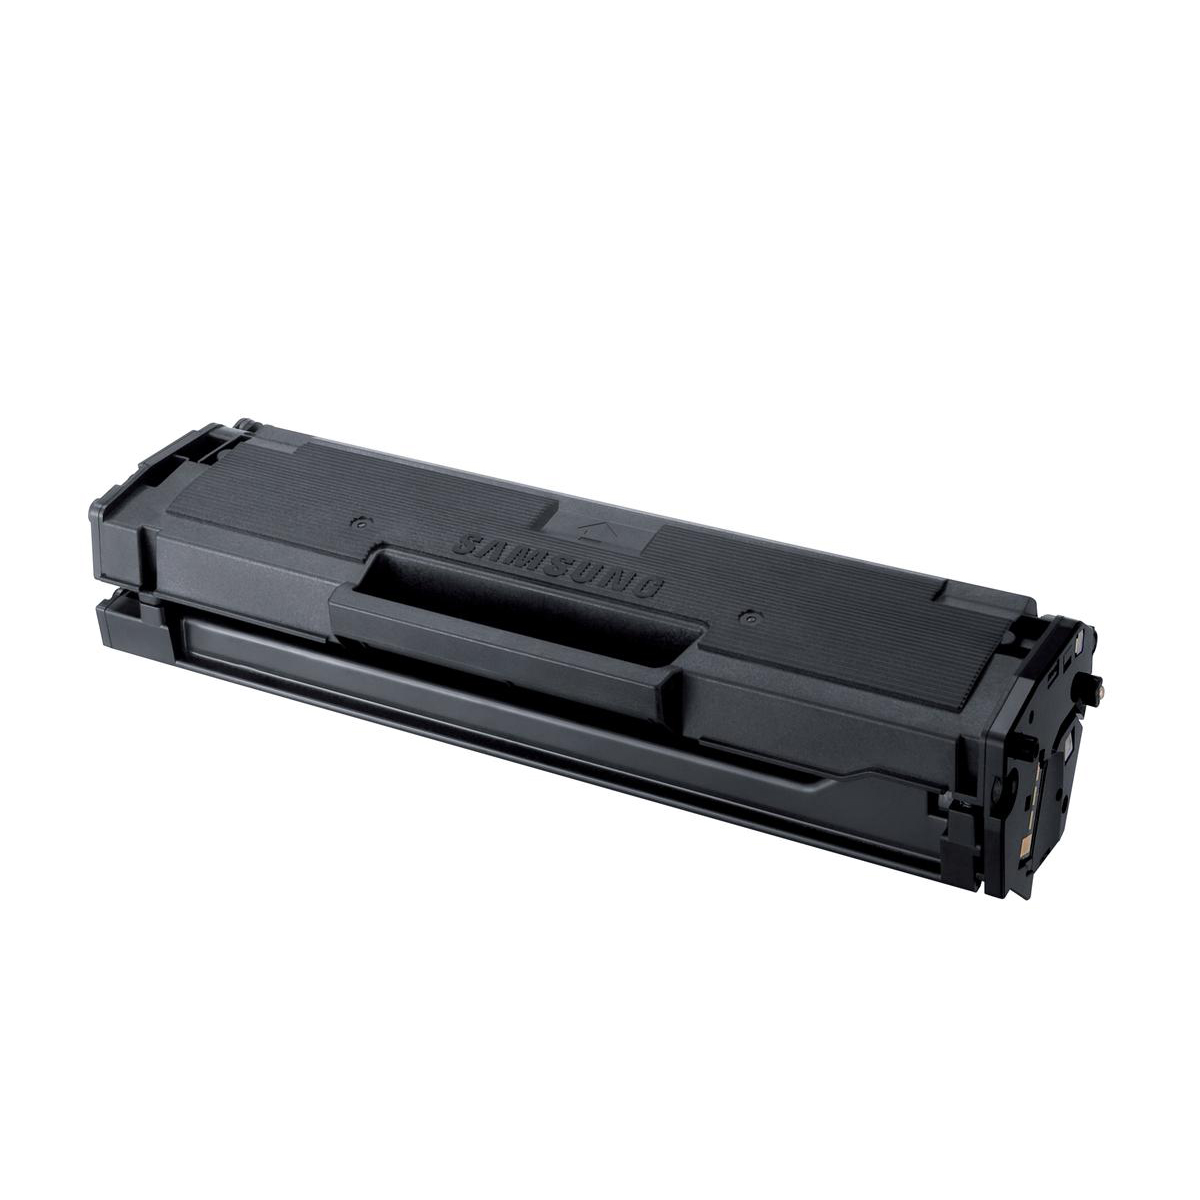 Samsung Laser Toner Cartridge Page Life 1500pp Black Ref SU696A